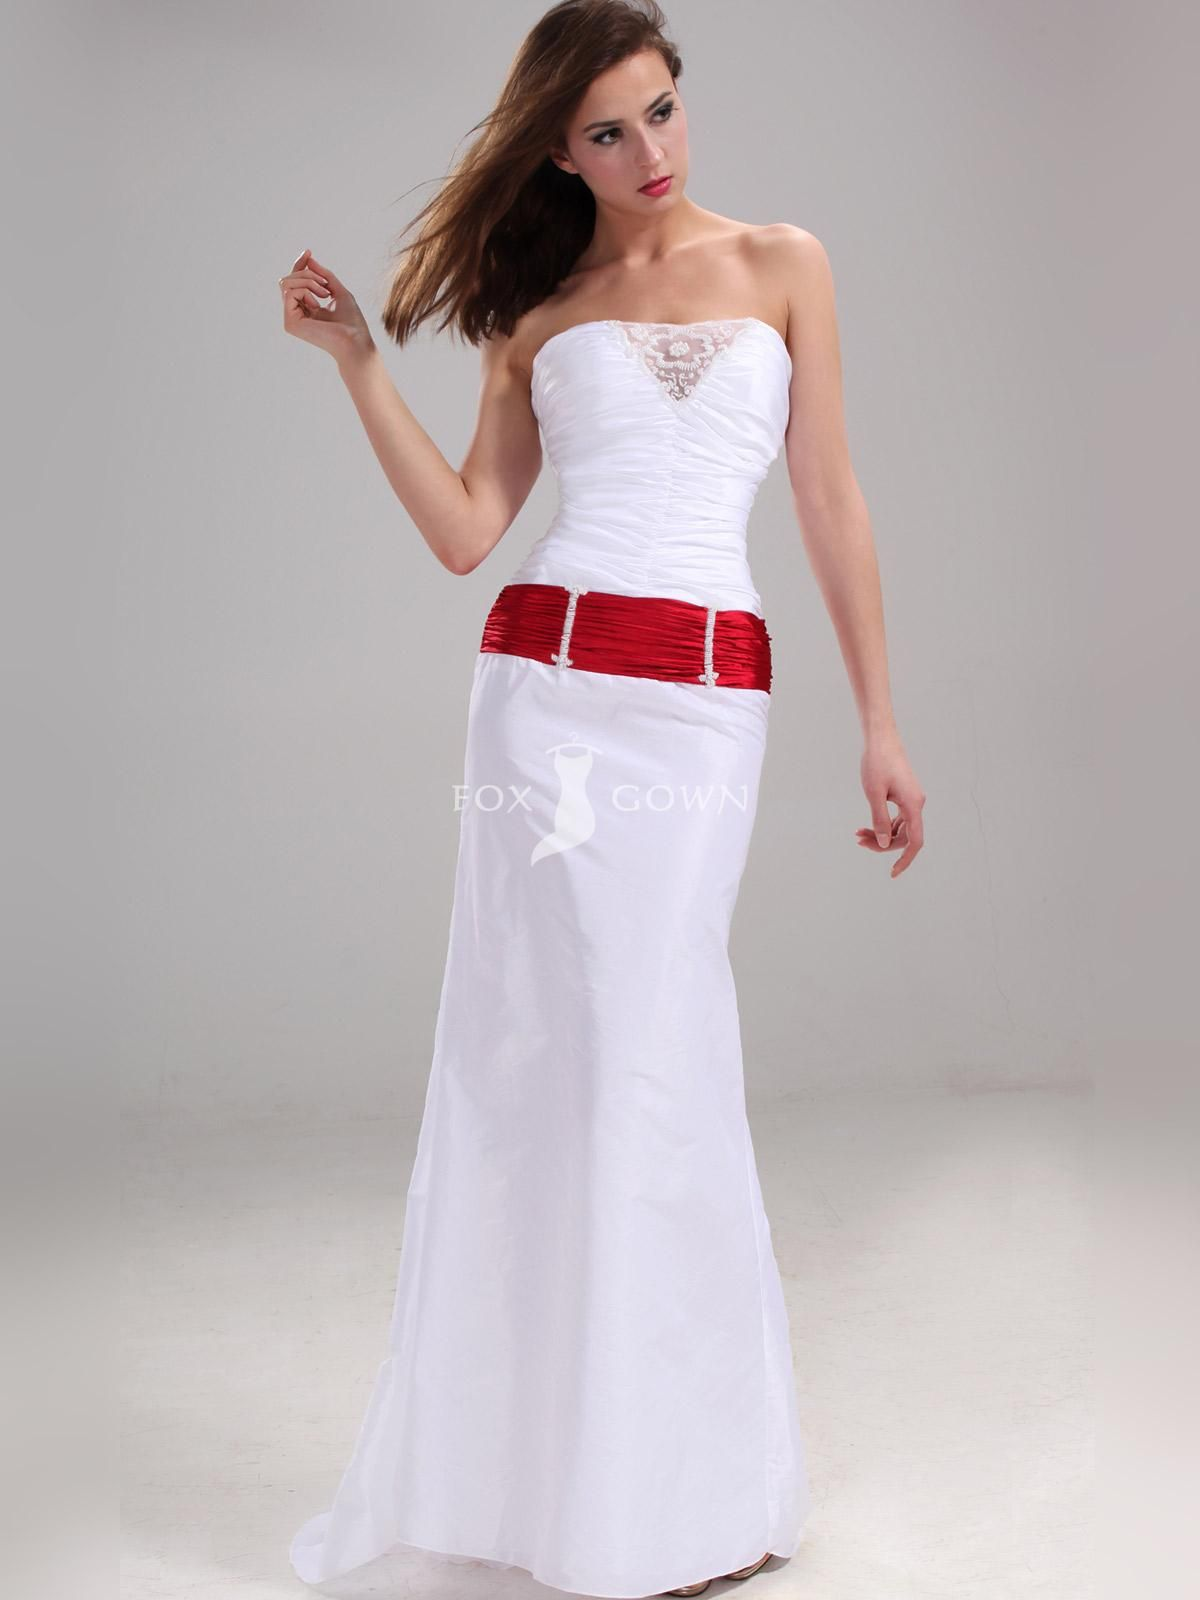 white strapless lace v neck prom dress red belt | Wedding Ideas ...